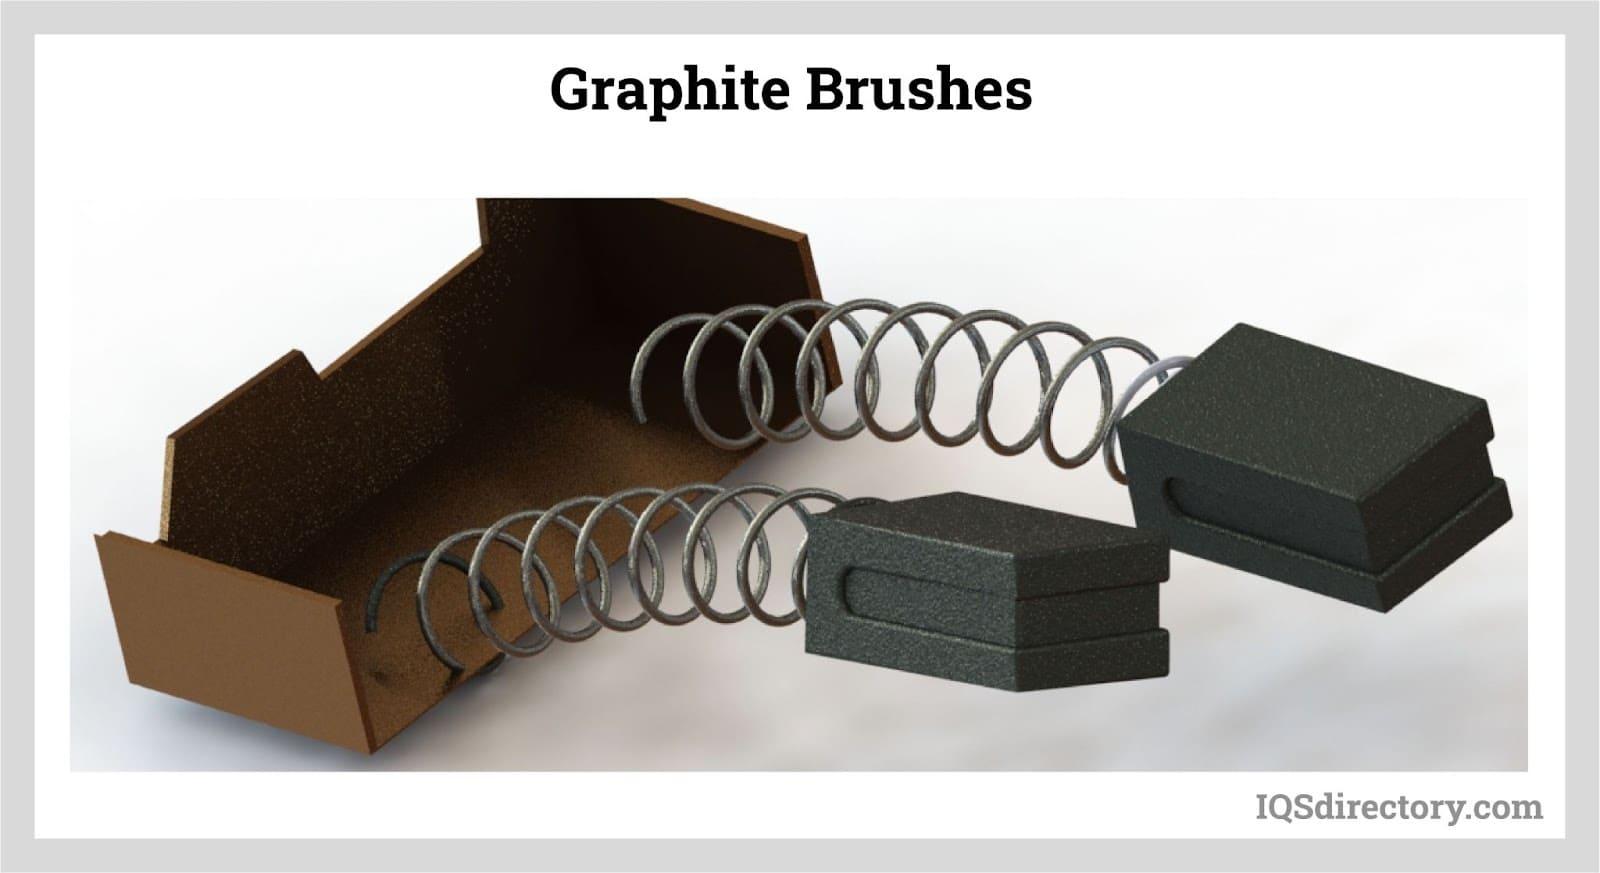 Graphite Brushes